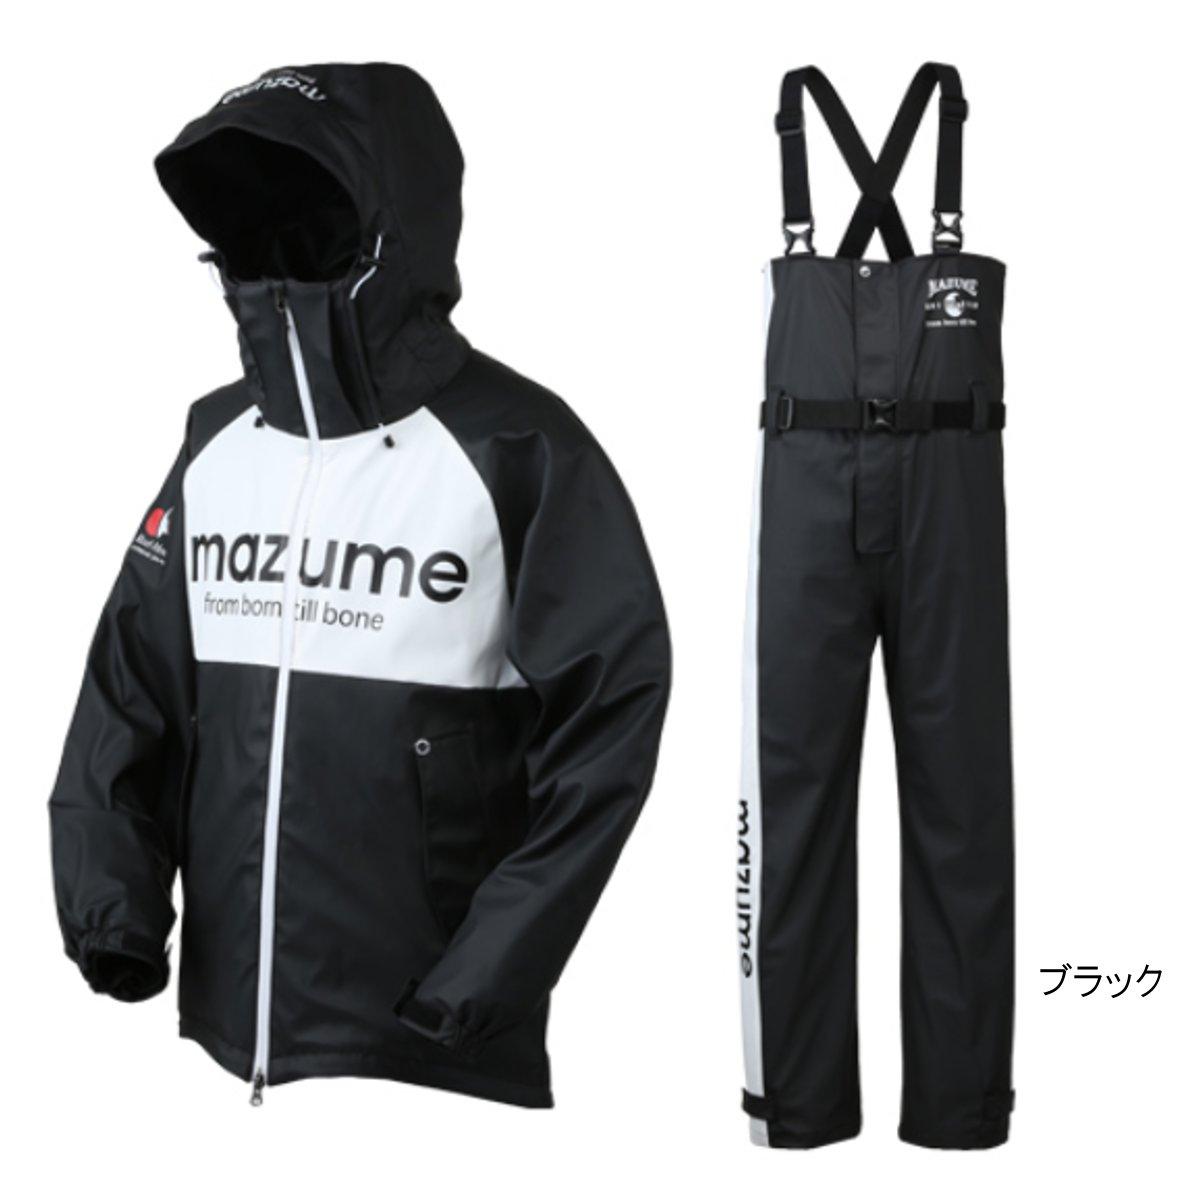 mazume ROUGH WATER レインスーツ II MZRS-383 L ブラック(東日本店)